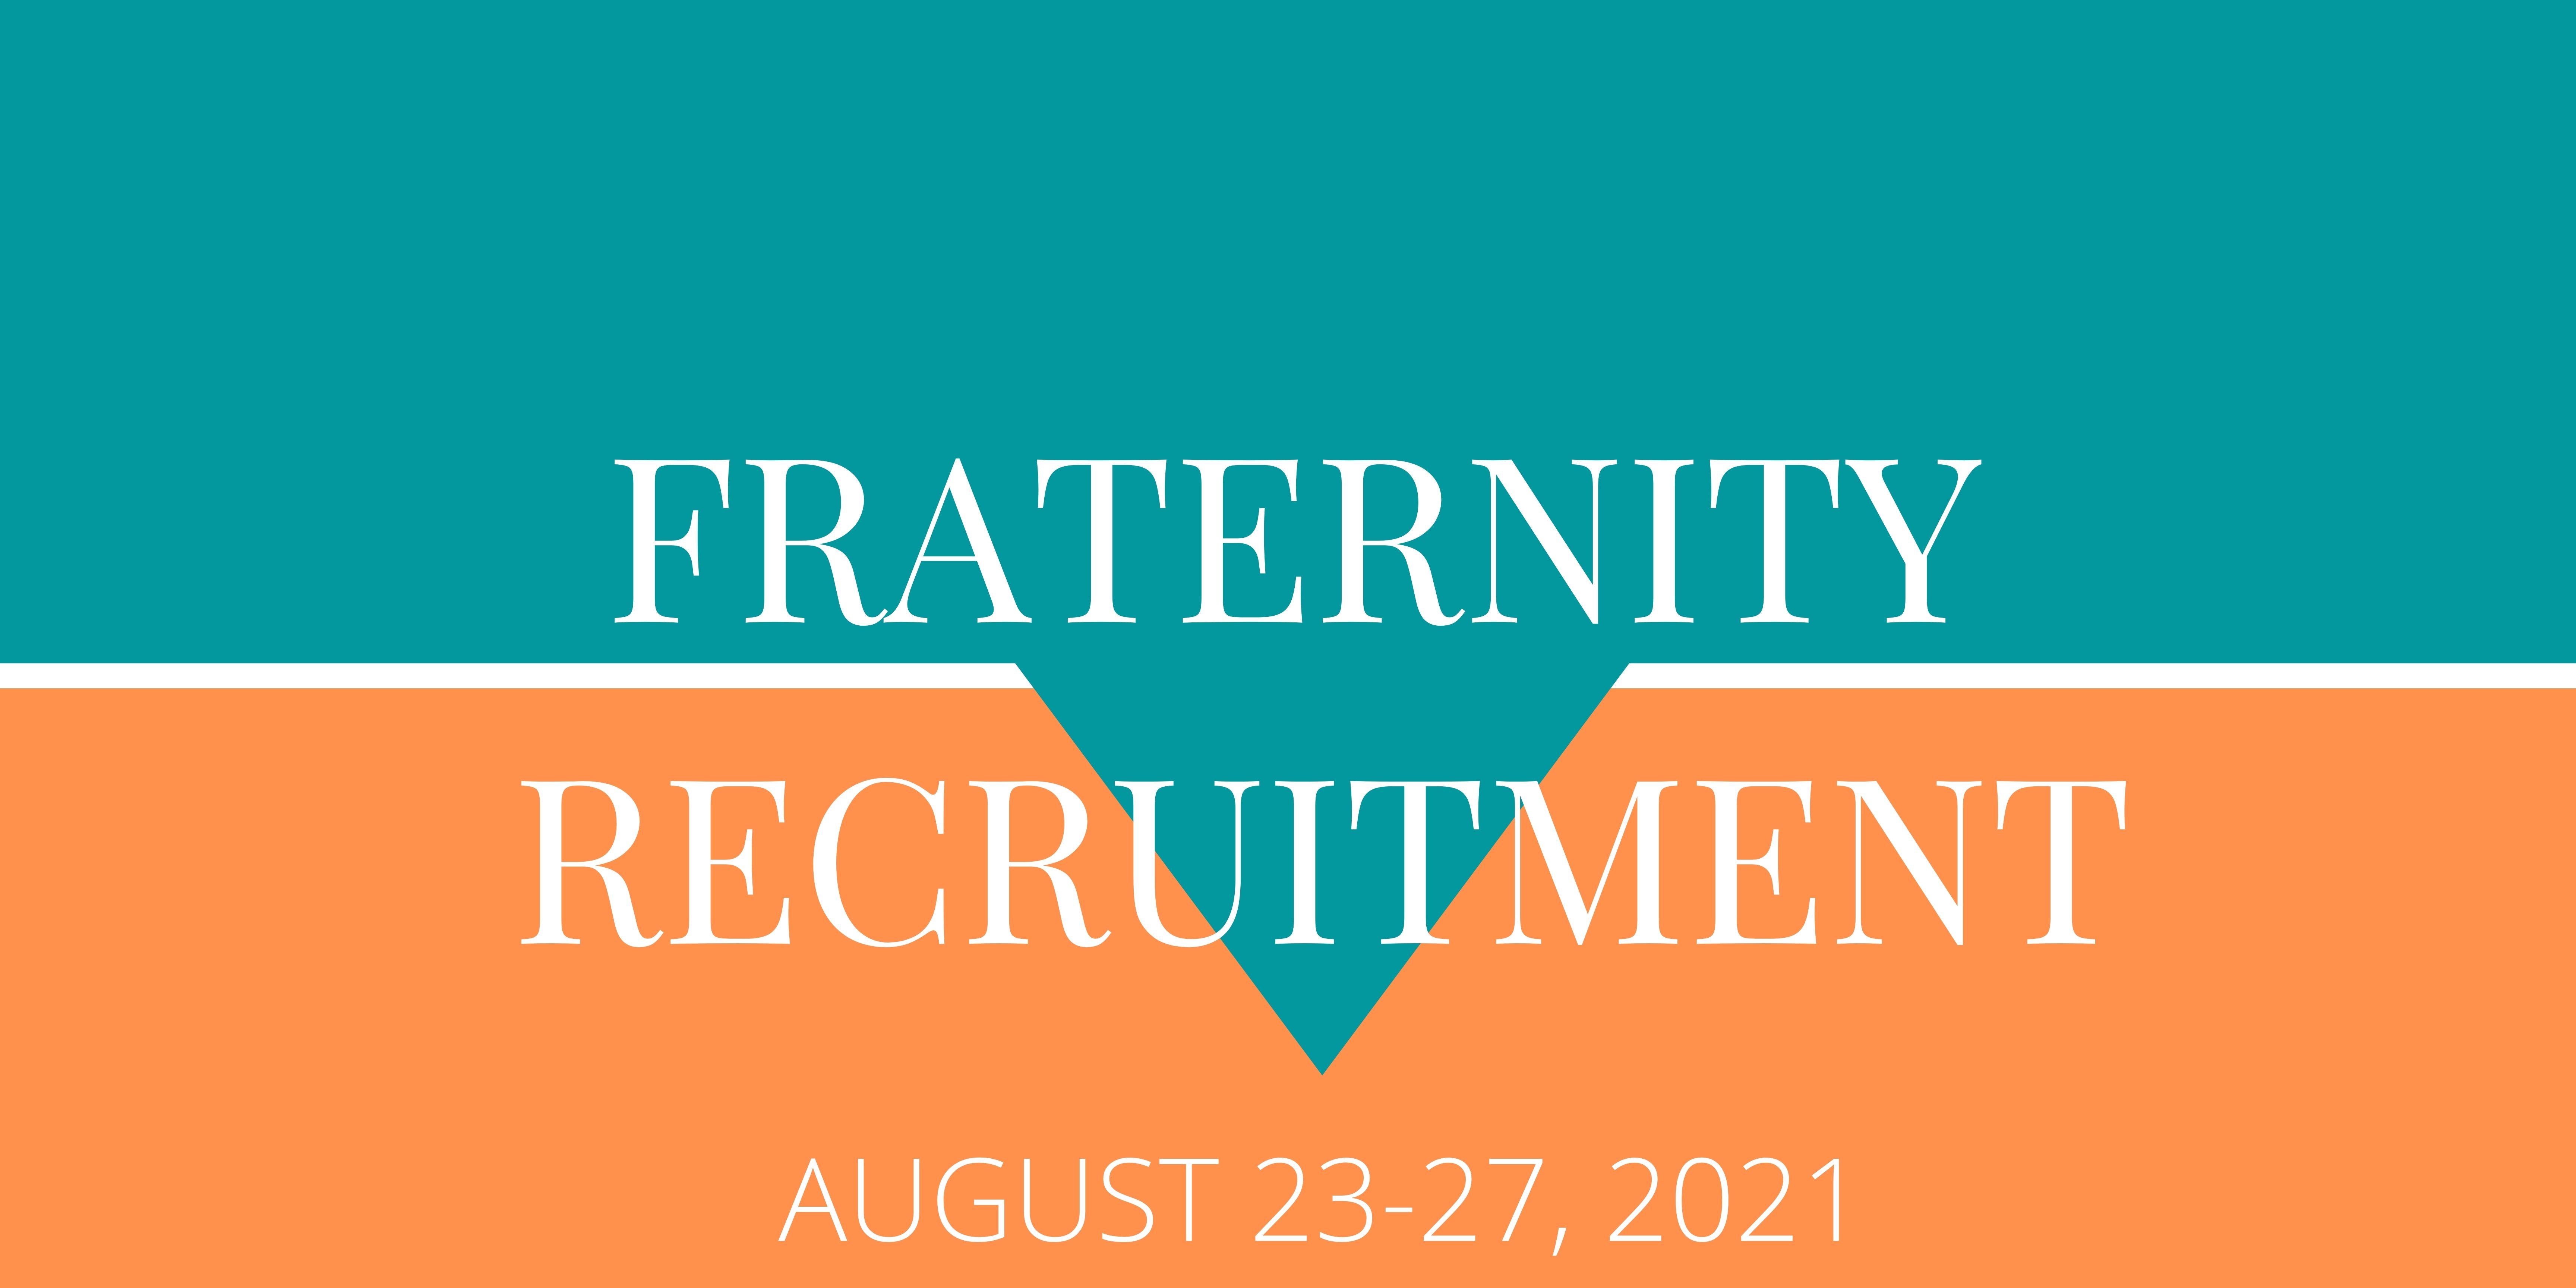 Fall 2020 Fraternity Recruitment